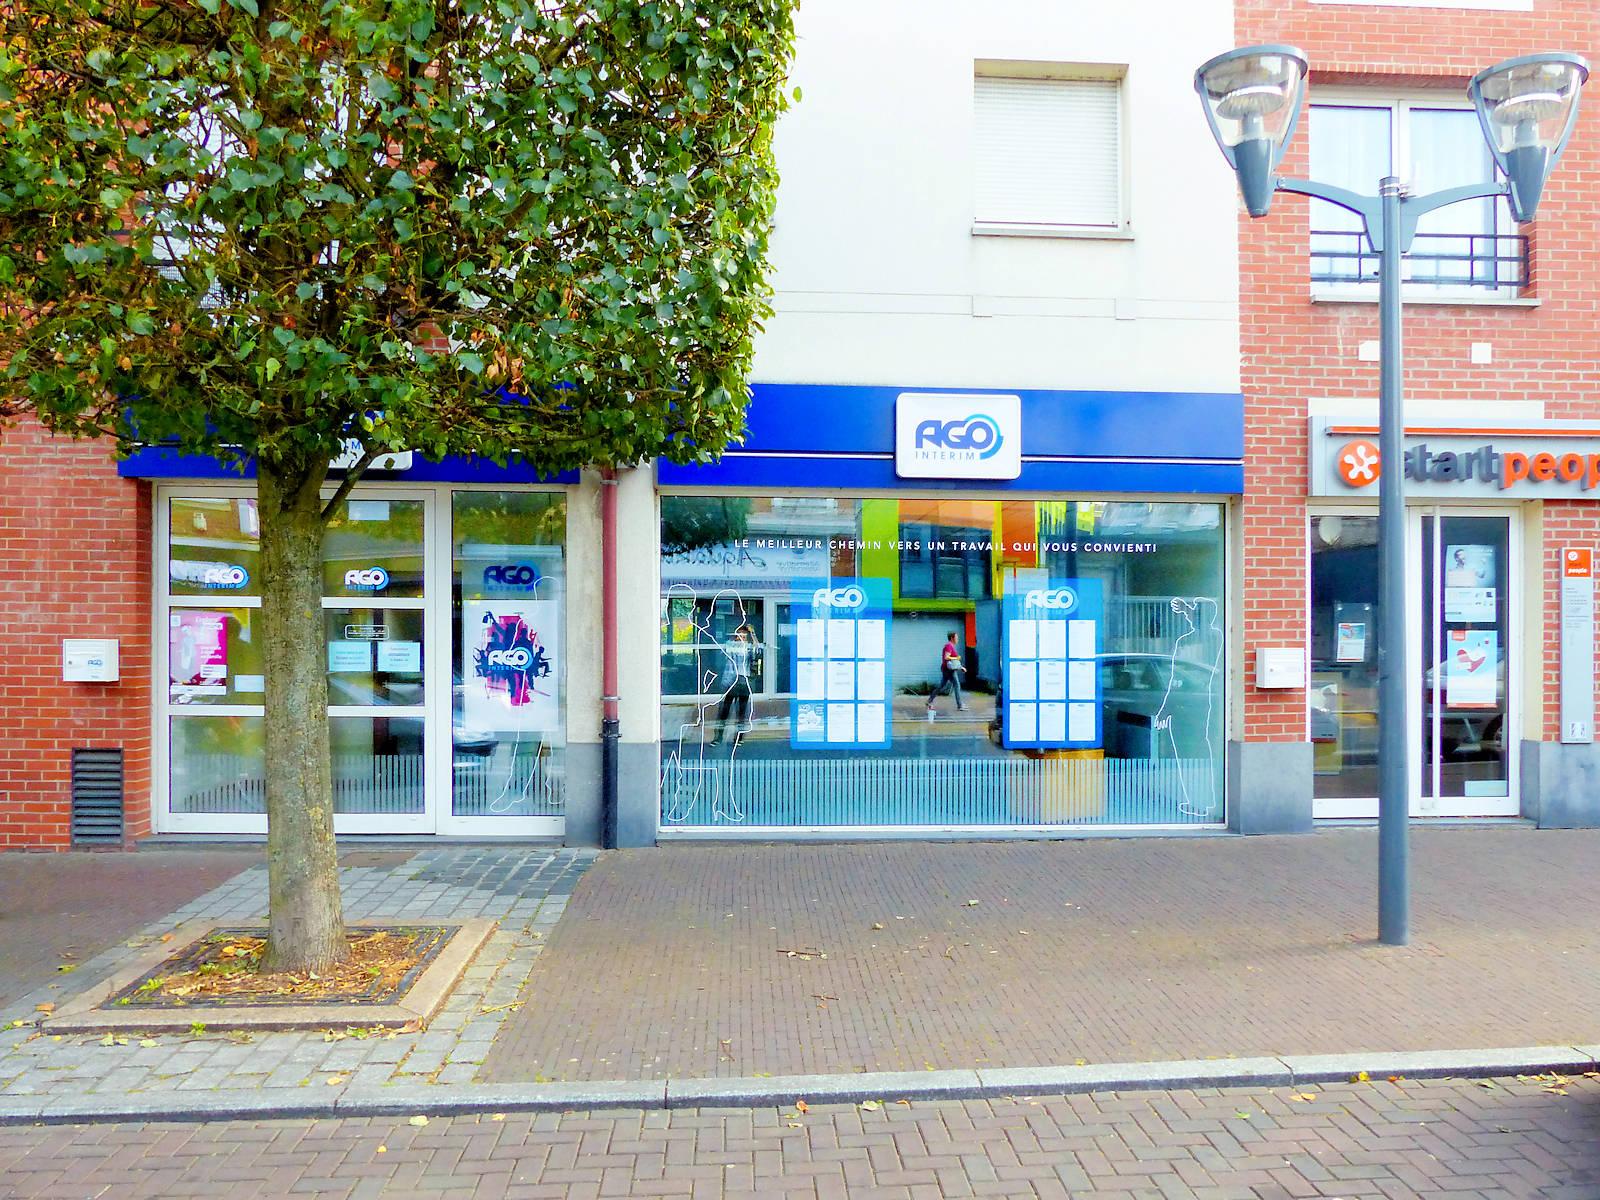 Emploi Tourcoing - AGO Intérim, Rue de la Cloche